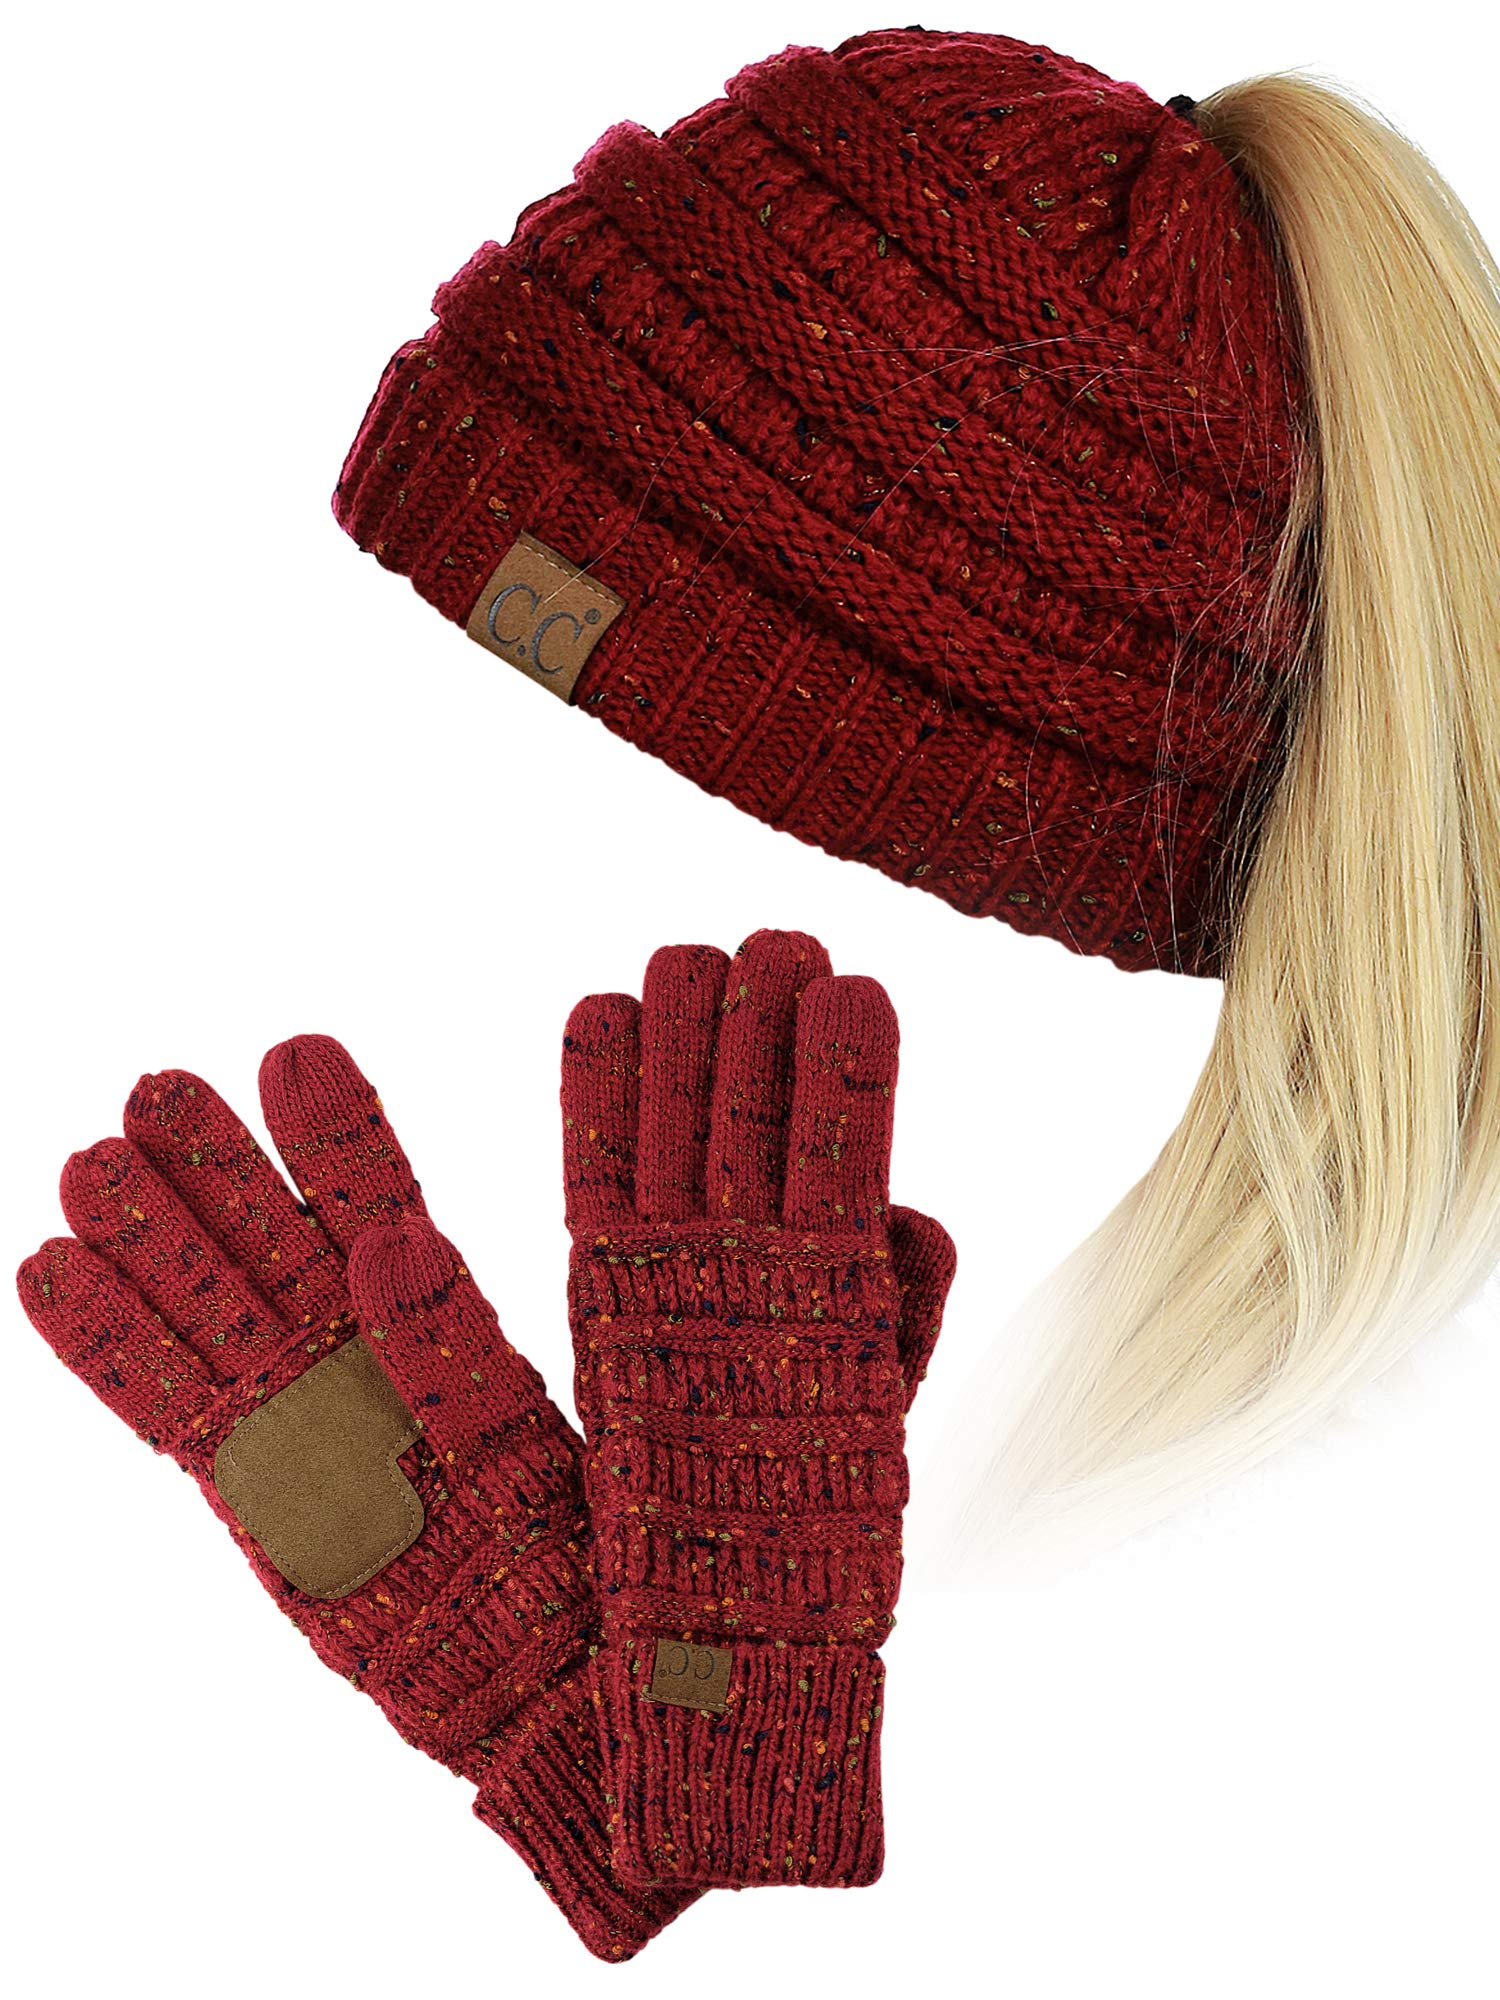 C.C BeanieTail Messy High Bun Cable Knit Beanie and Anti-Slip Touchscreen Gloves Set, Confetti Black by C.C